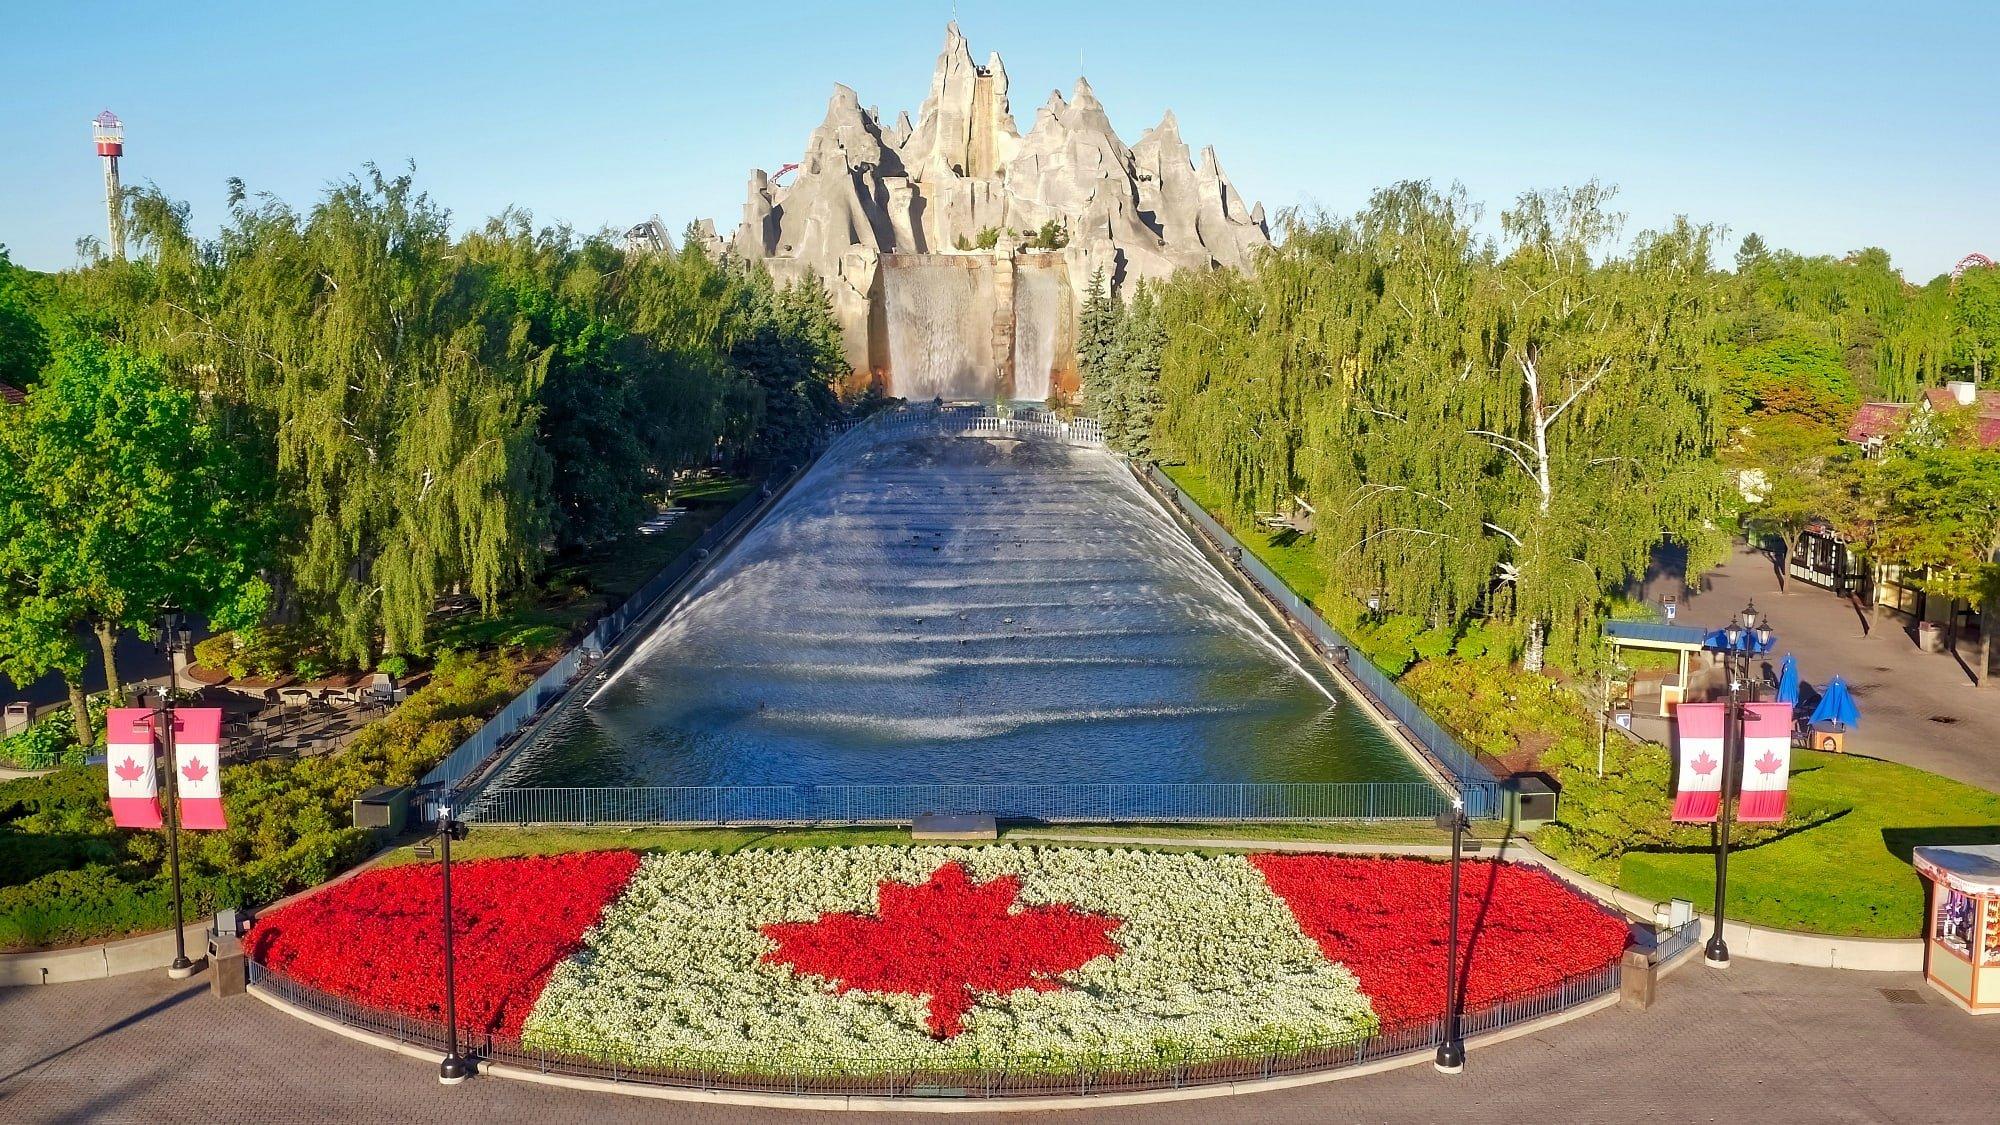 Canada's Wonderland entrance